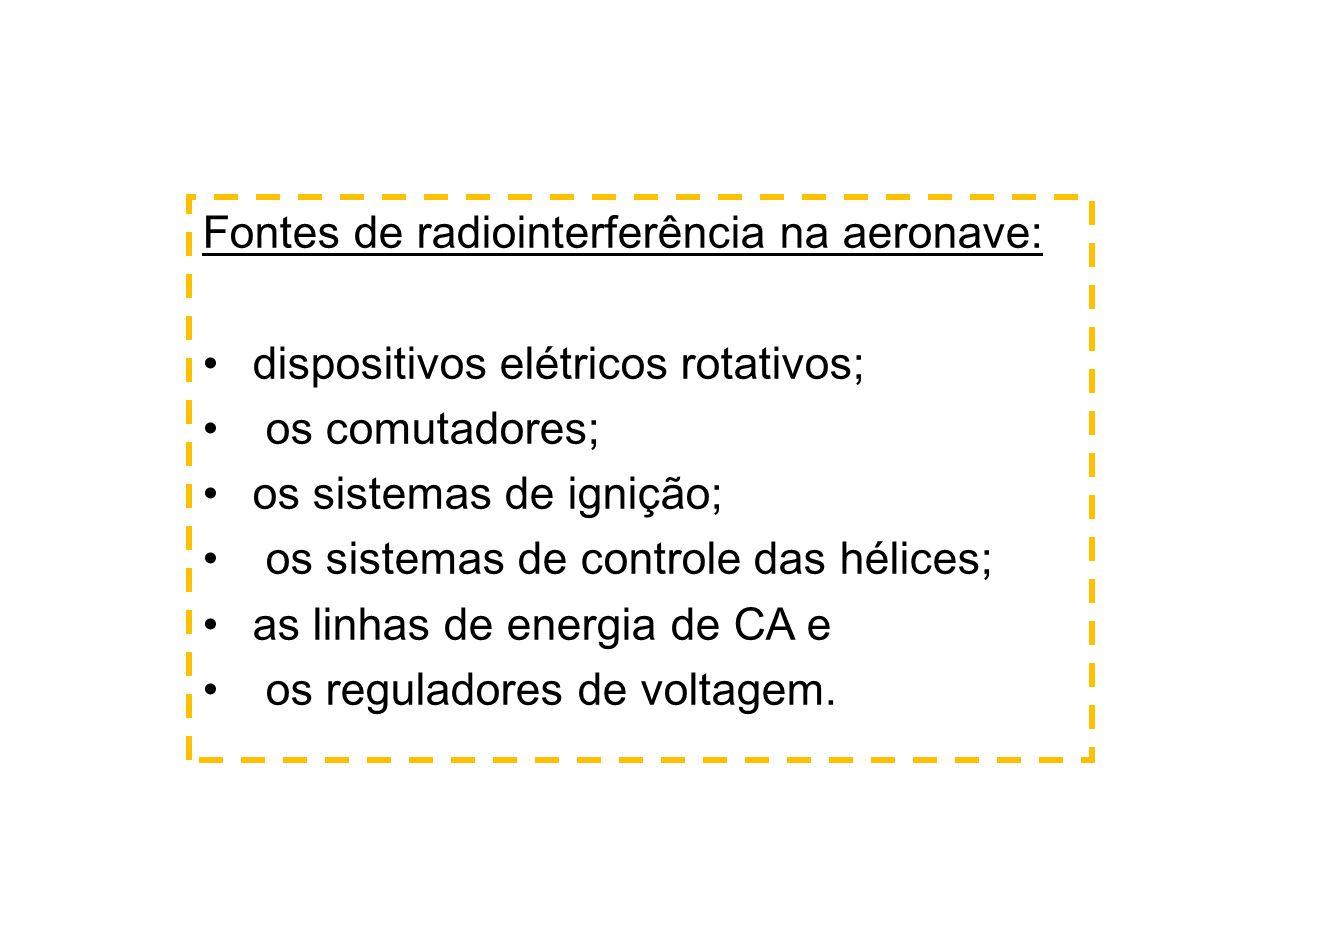 Fontes de radiointerferência na aeronave: